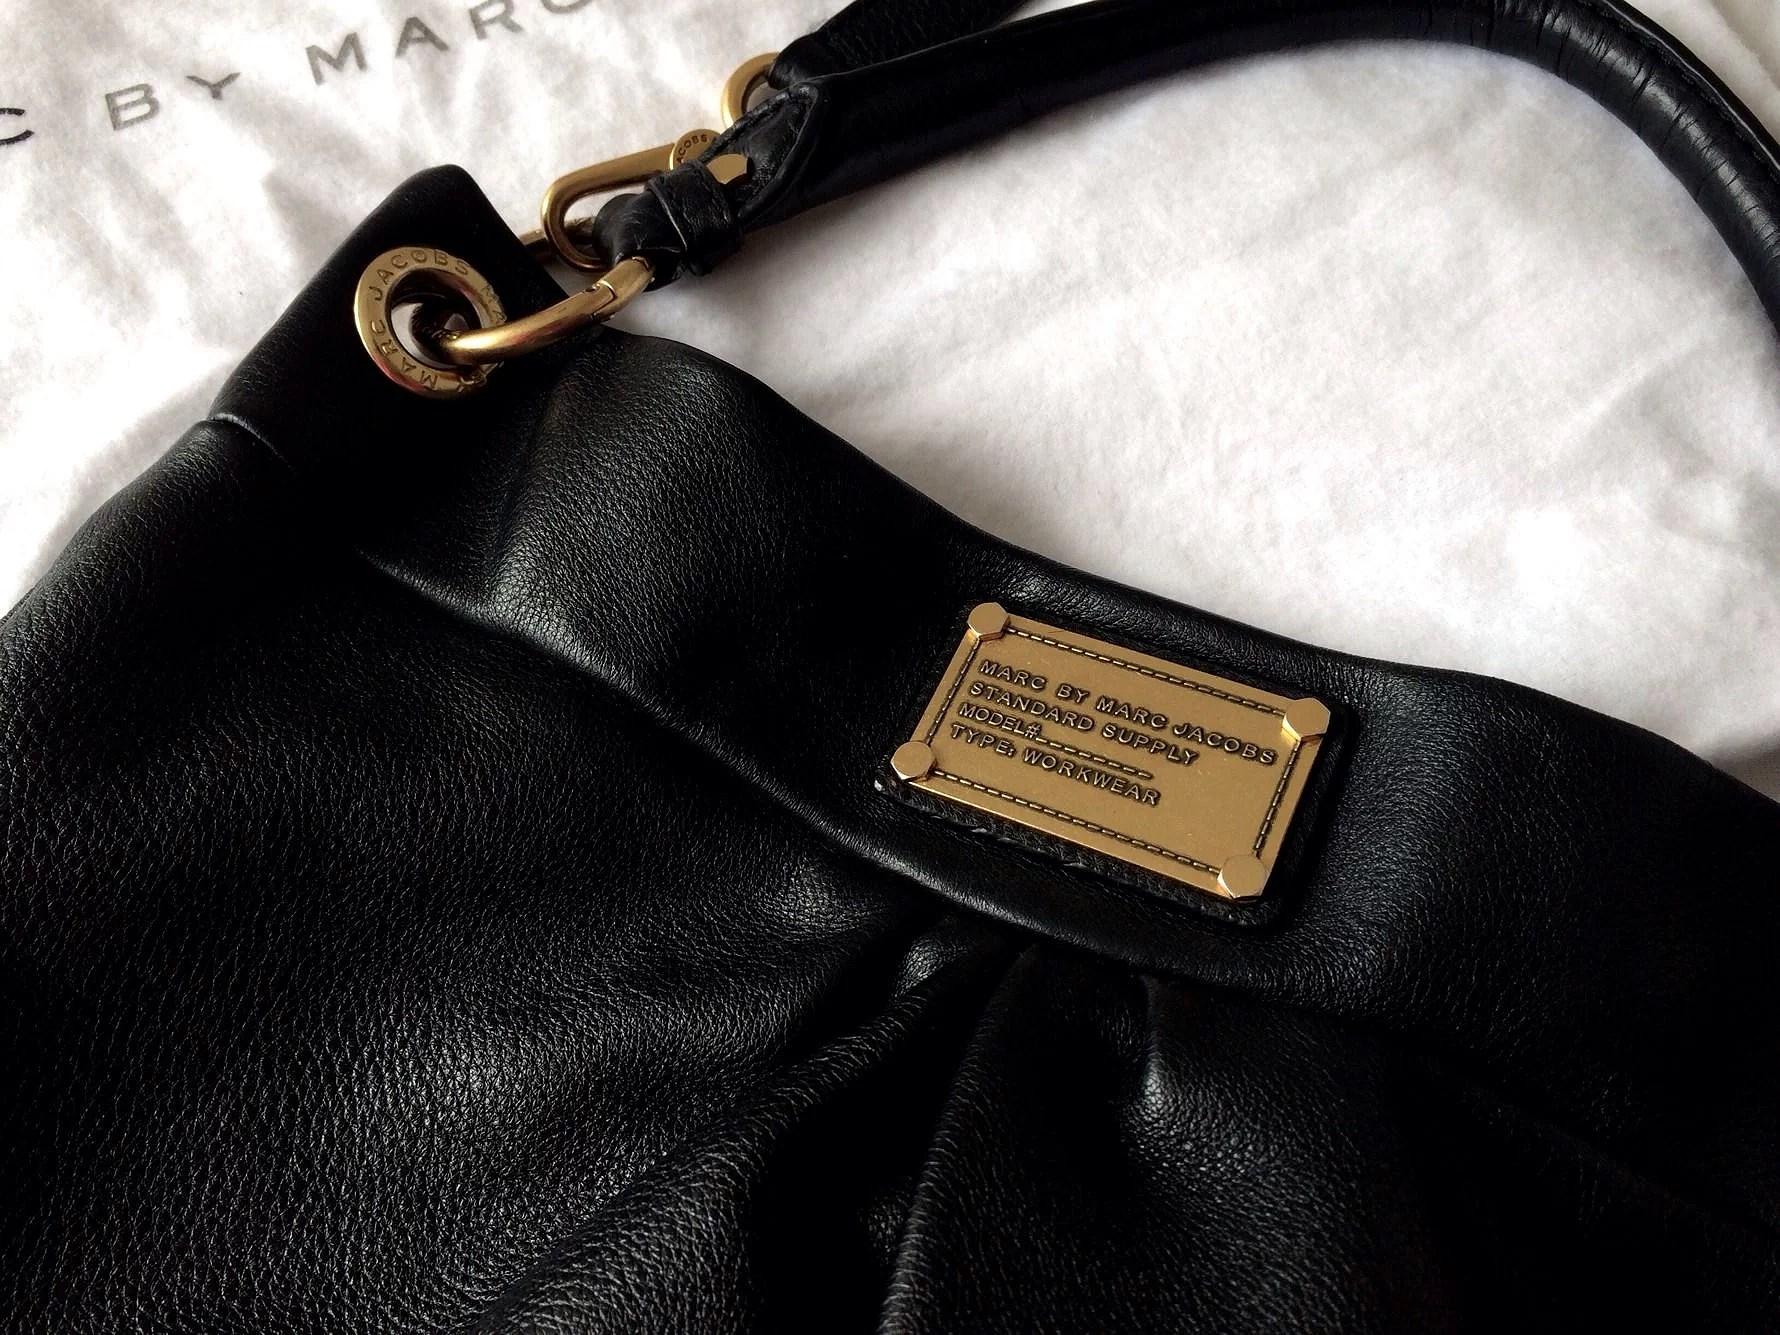 Marc Jacobs Dator Väska : Marc by jacobs bag new in linsve